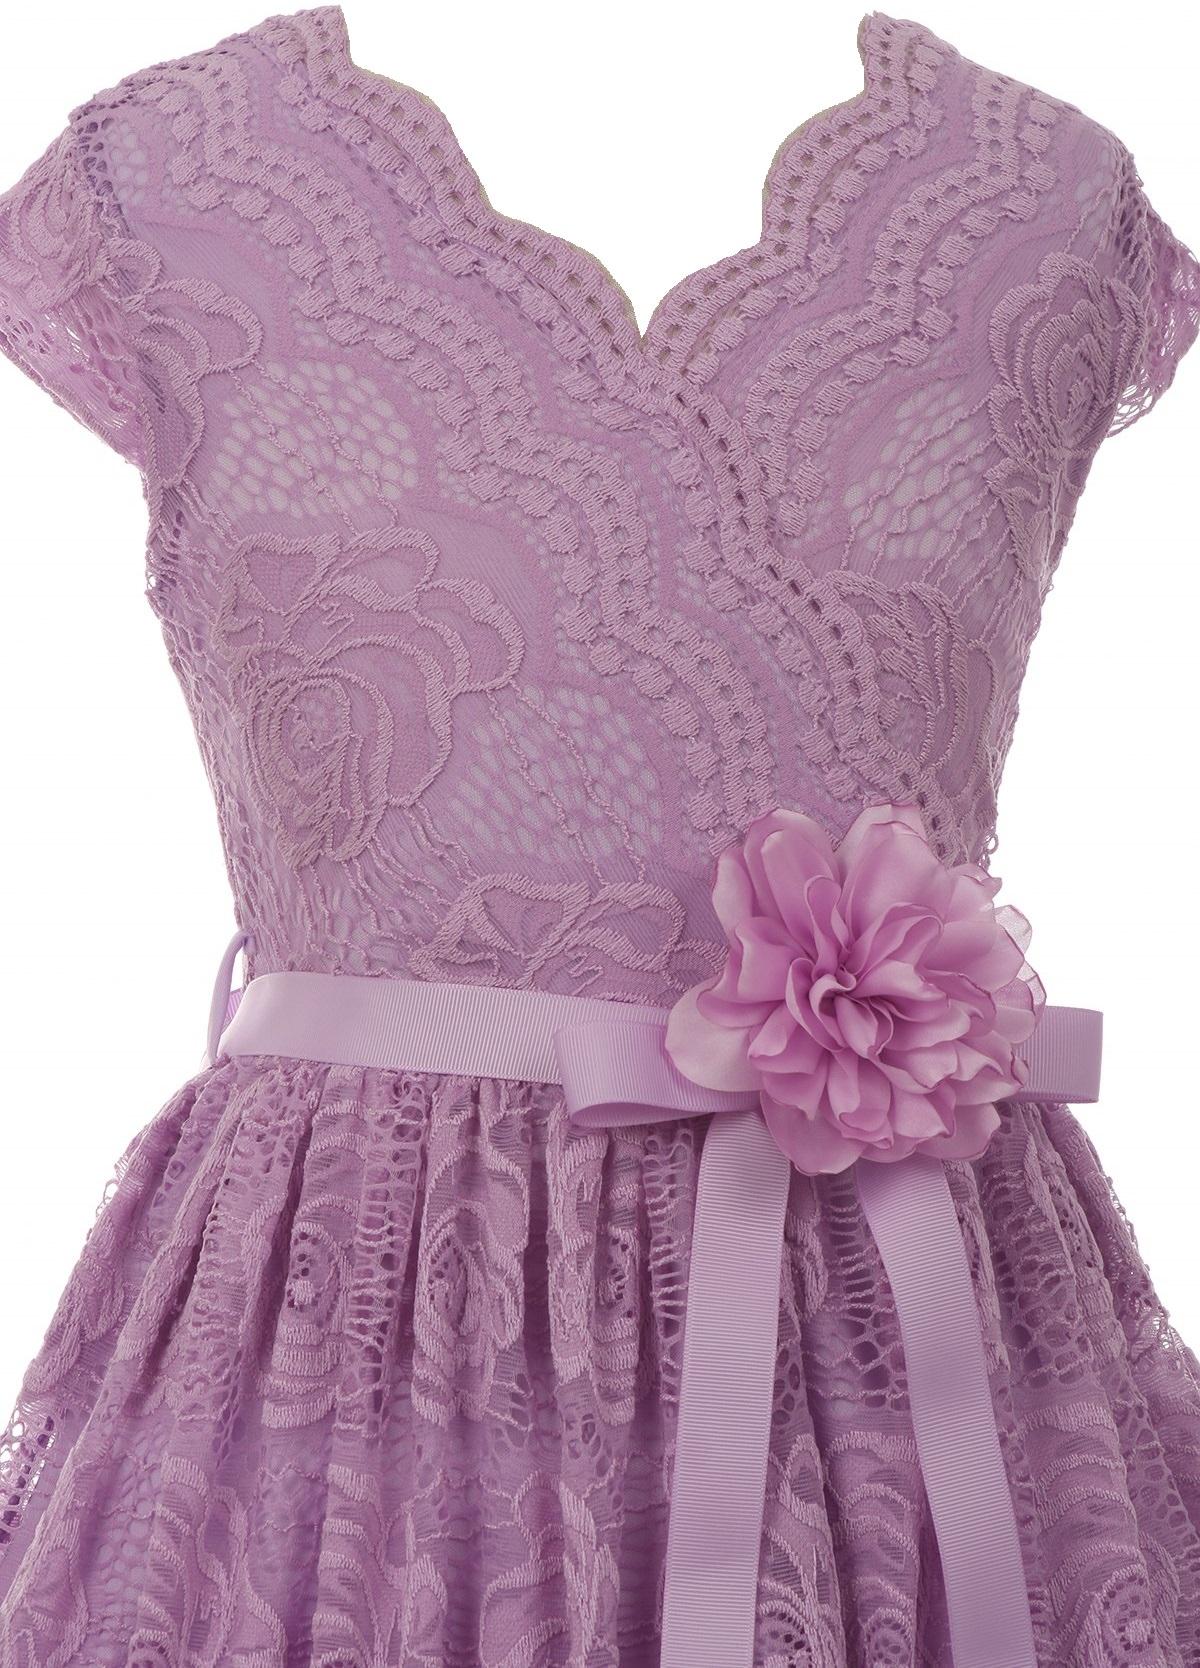 528f8629b6 Little Girl Cap Sleeve V Neck Flower Border Stretch Lace Corsage Belt  Flower Girl Dress (20JK66S) Lilac 4 - Walmart.com